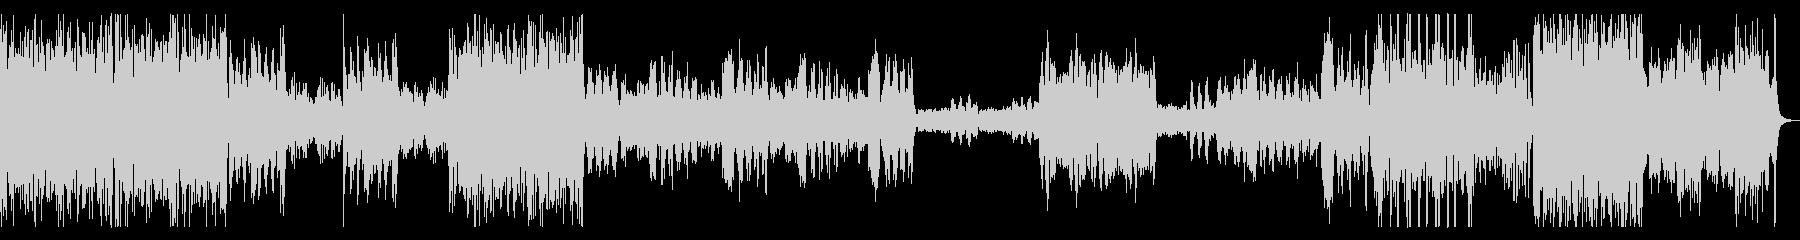 Coppelia to Mazurka Orchestra Edition's unreproduced waveform